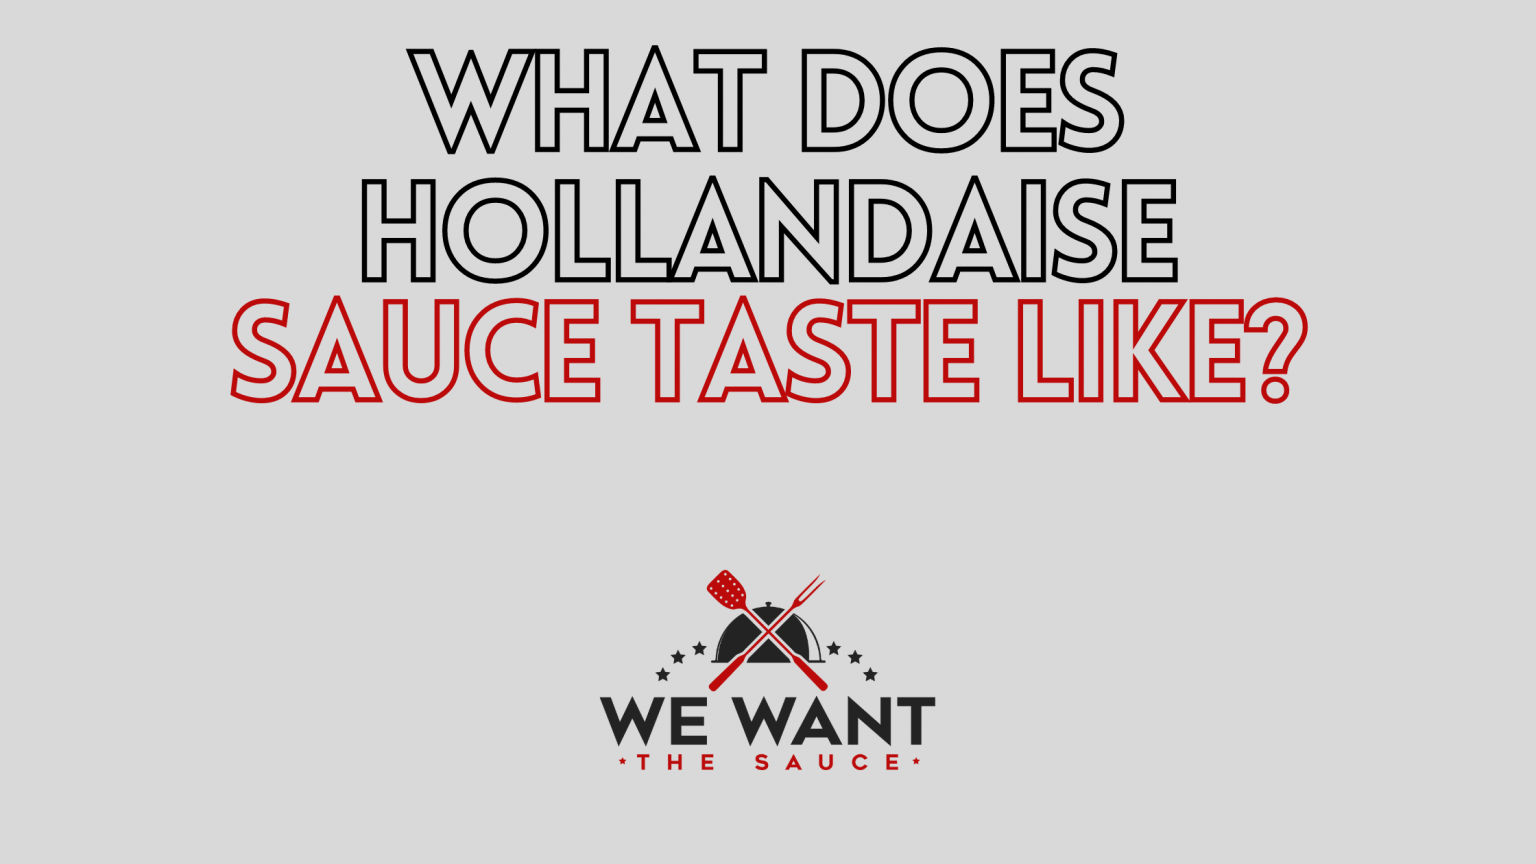 What Does Hollandaise Sauce Taste Like?